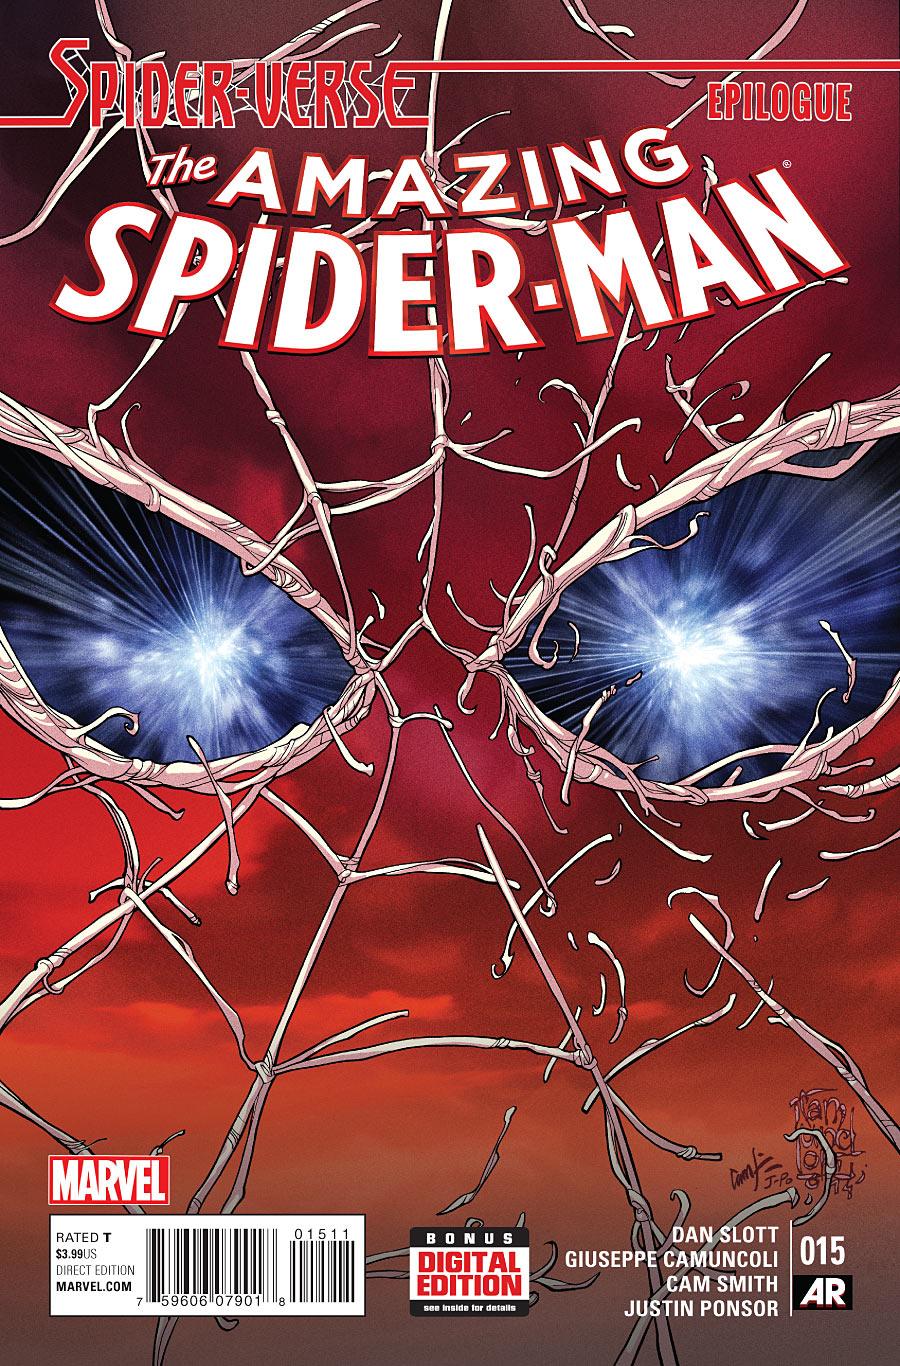 The Amazing Spider-Man #15